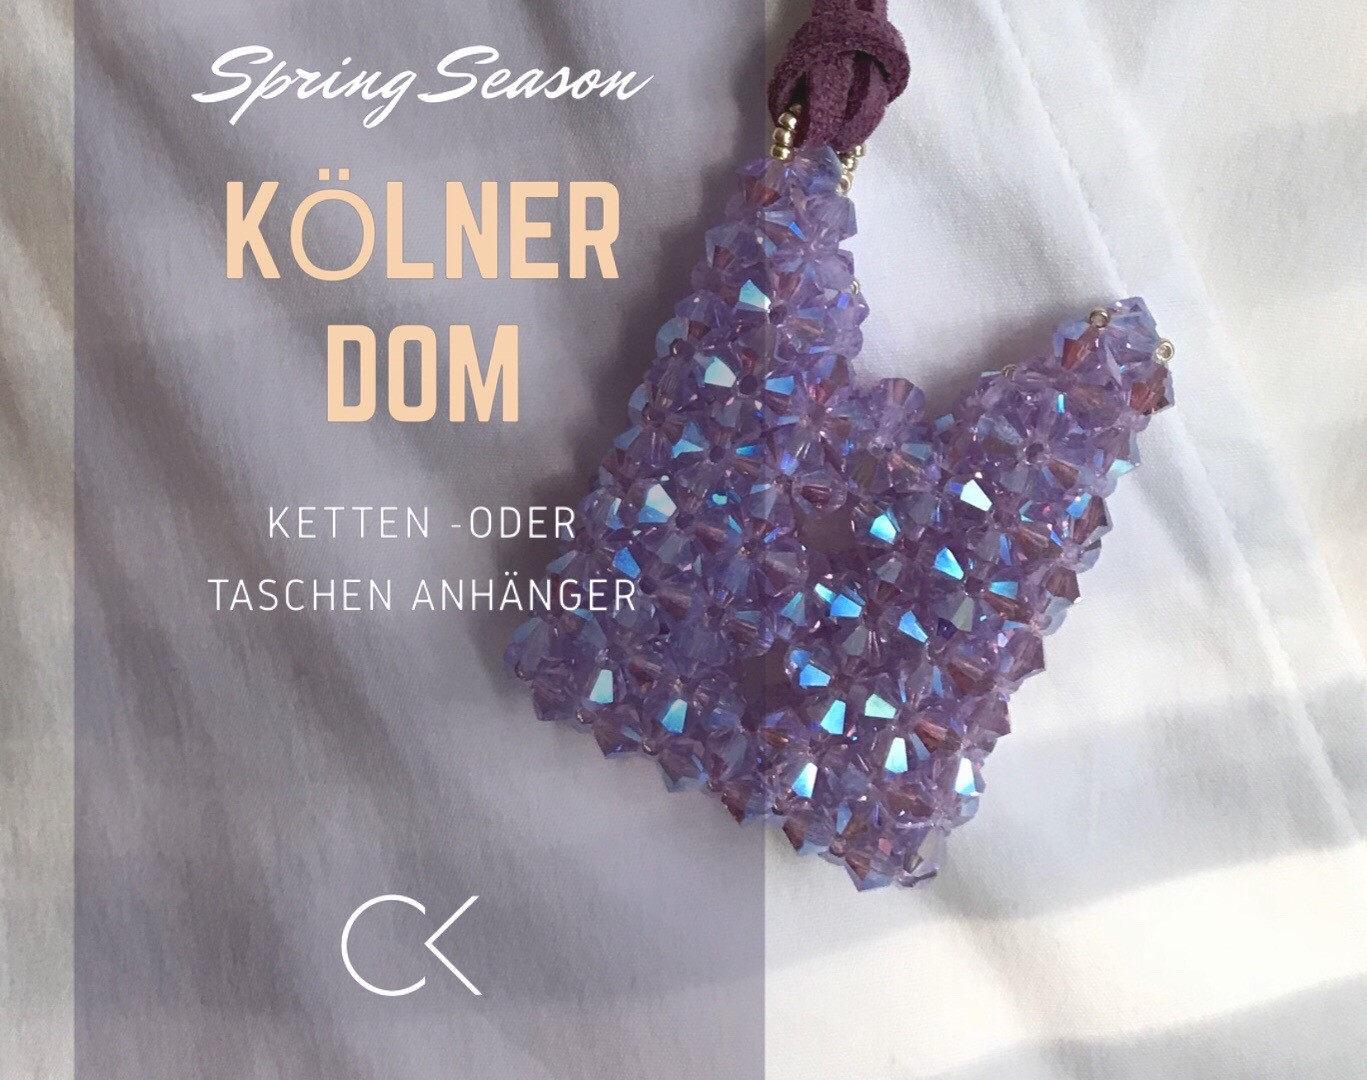 """Kölner Dom"" als Taschenanhänger"